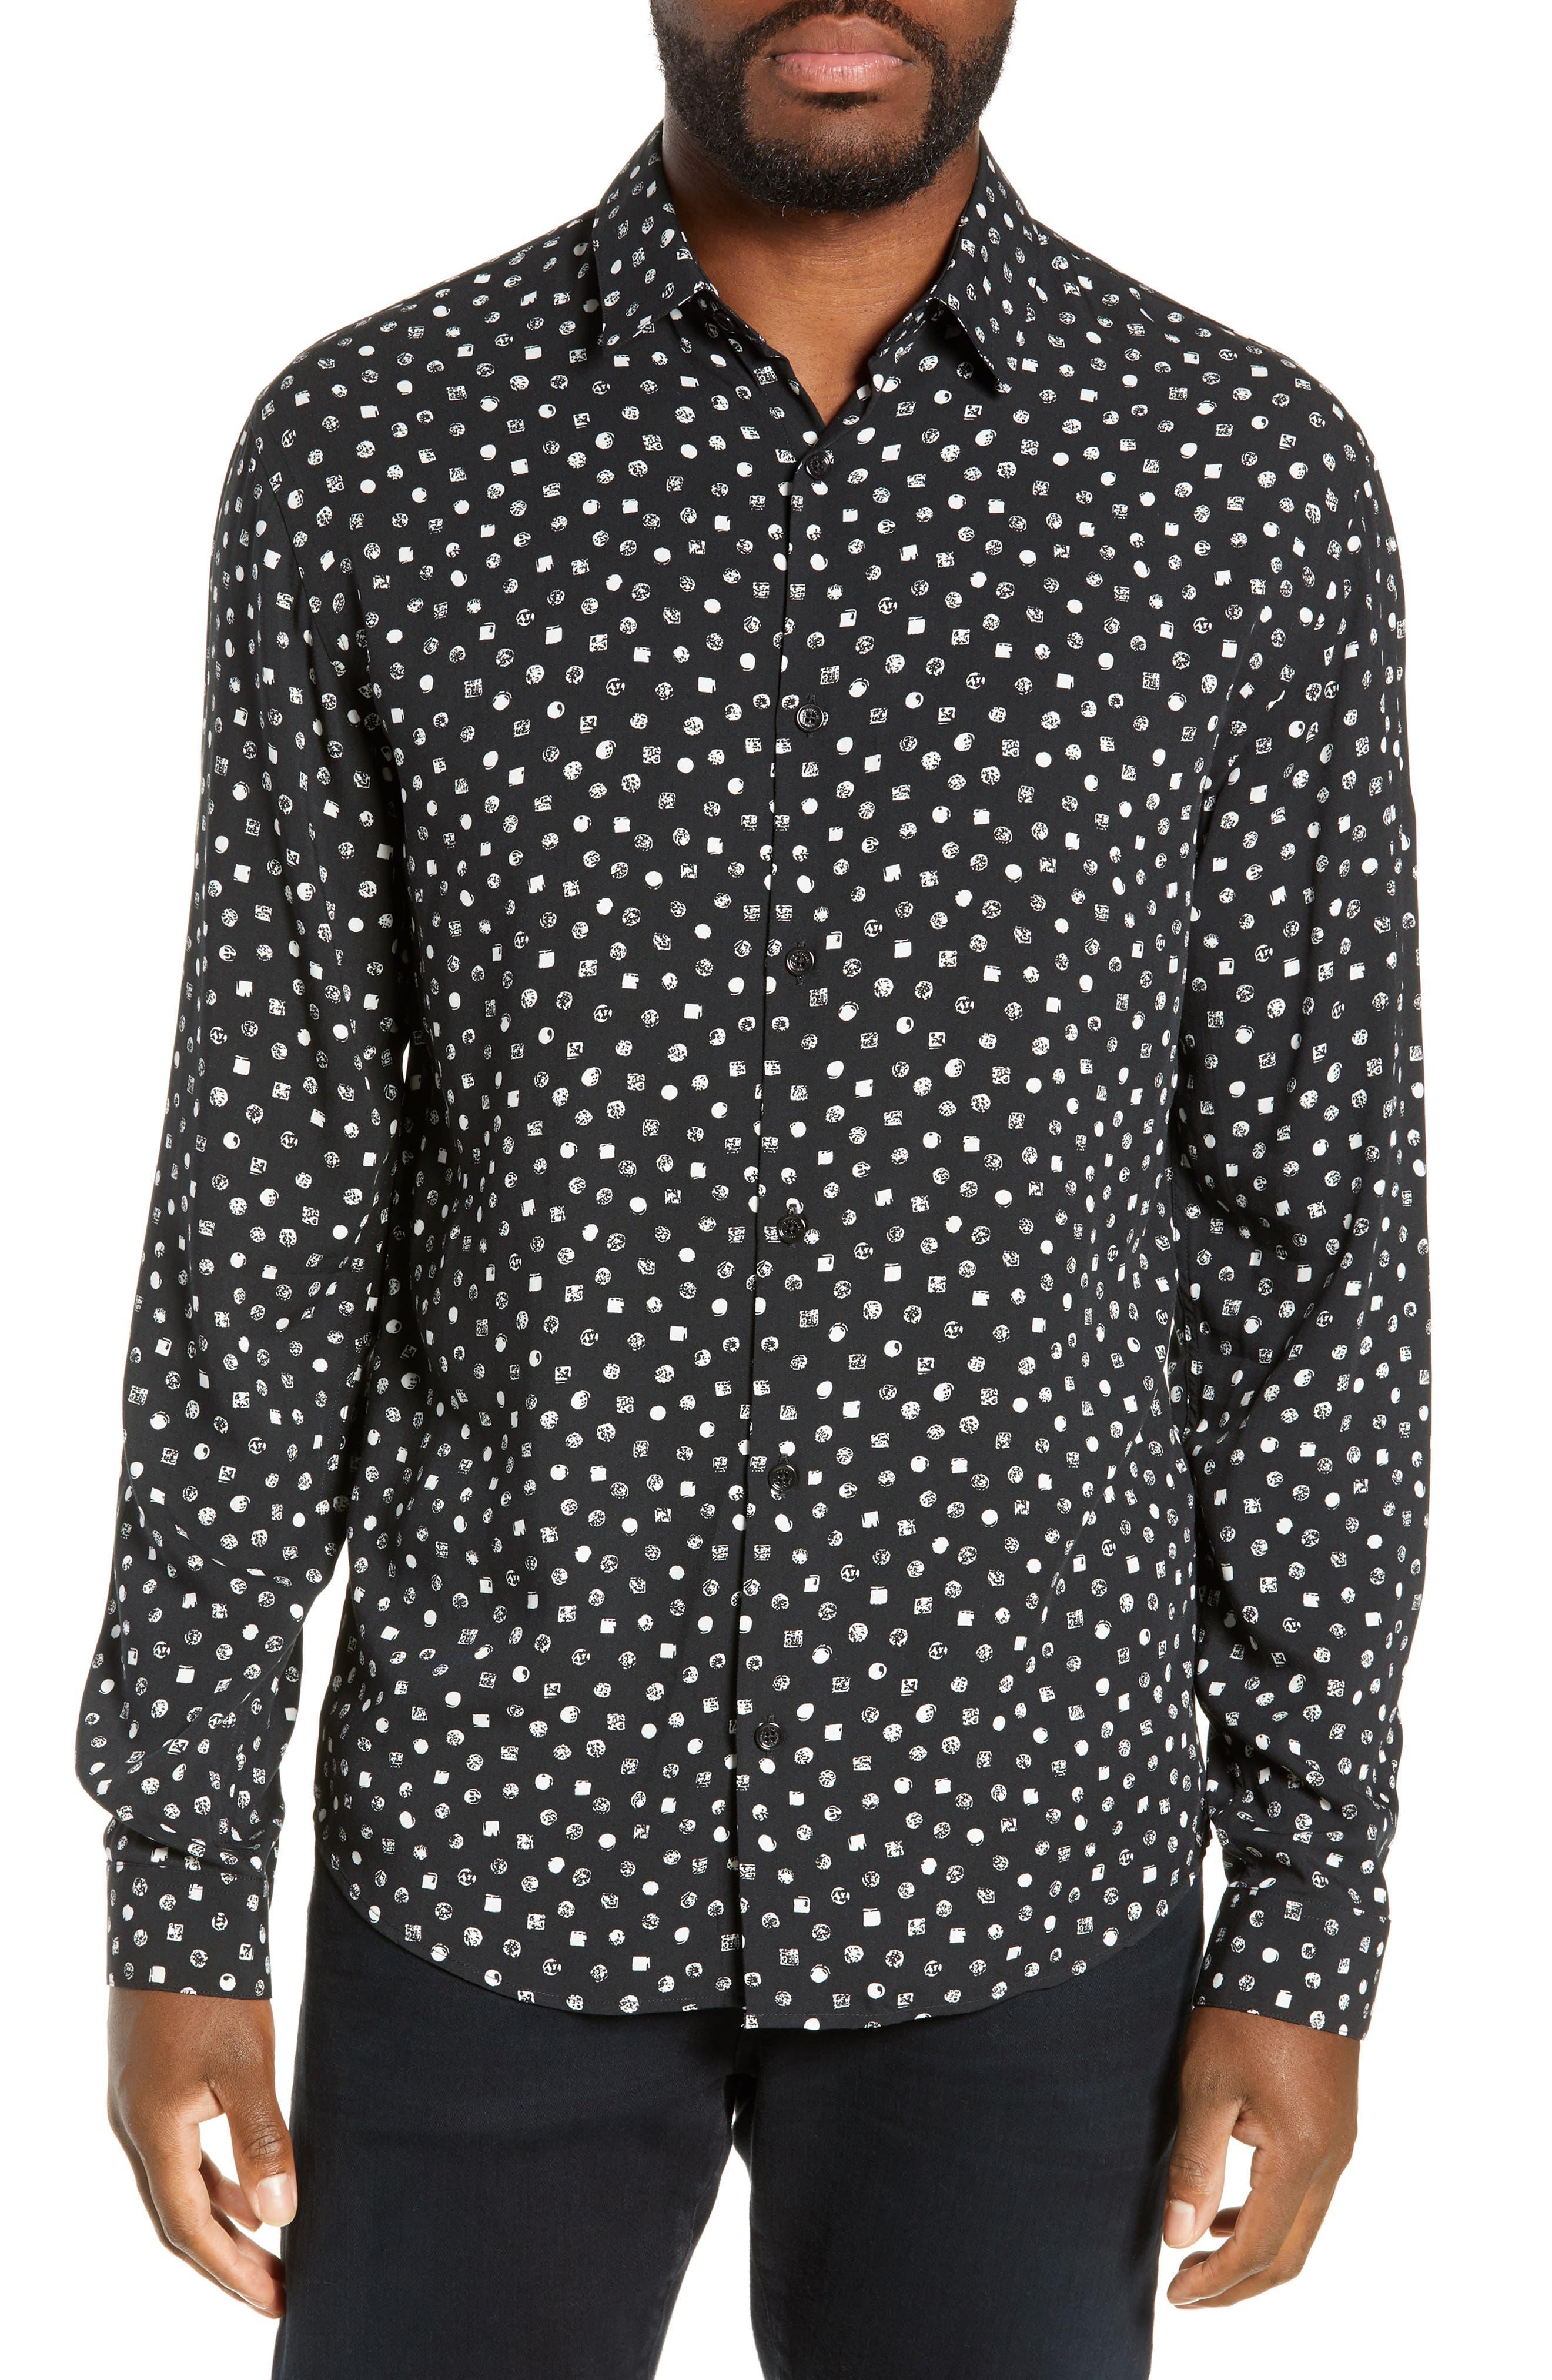 THE KOOPLES, Classic Fit Print Sport Shirt, Main thumbnail 1, color, BLACK WHITE